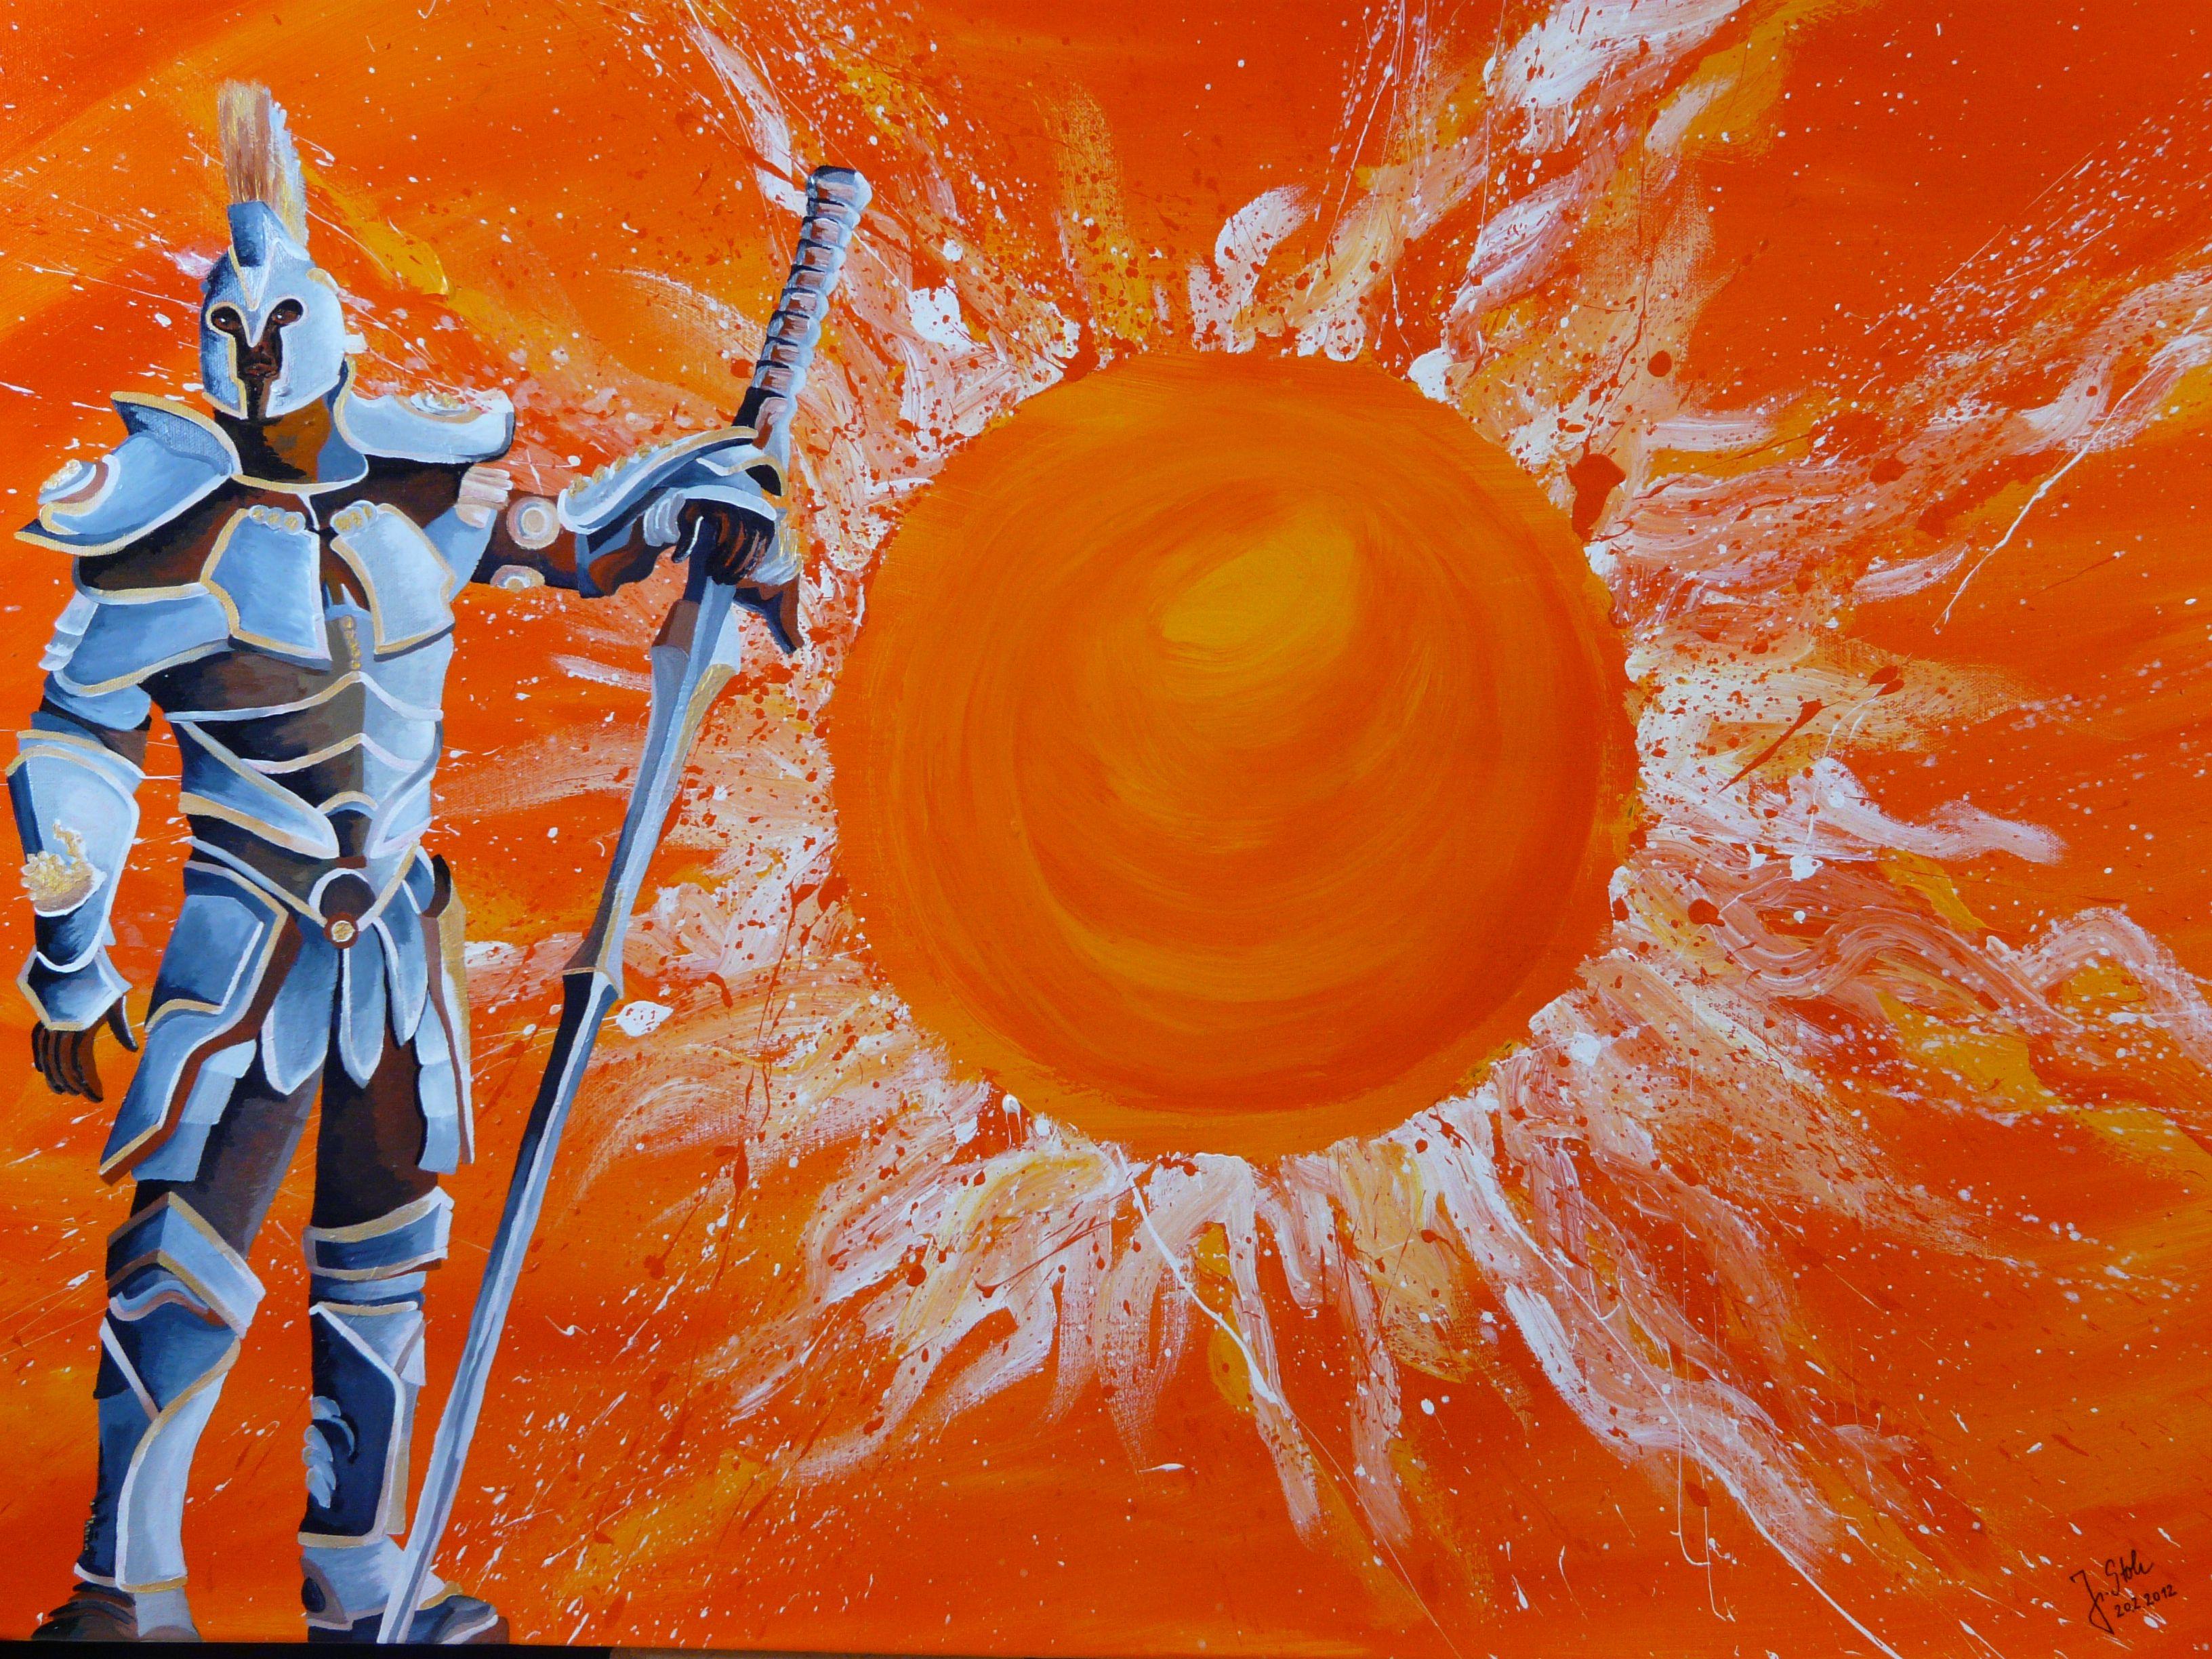 Sonnenkrieger, Acryl auf Leinwand, Glanzfirnis, 100cm x